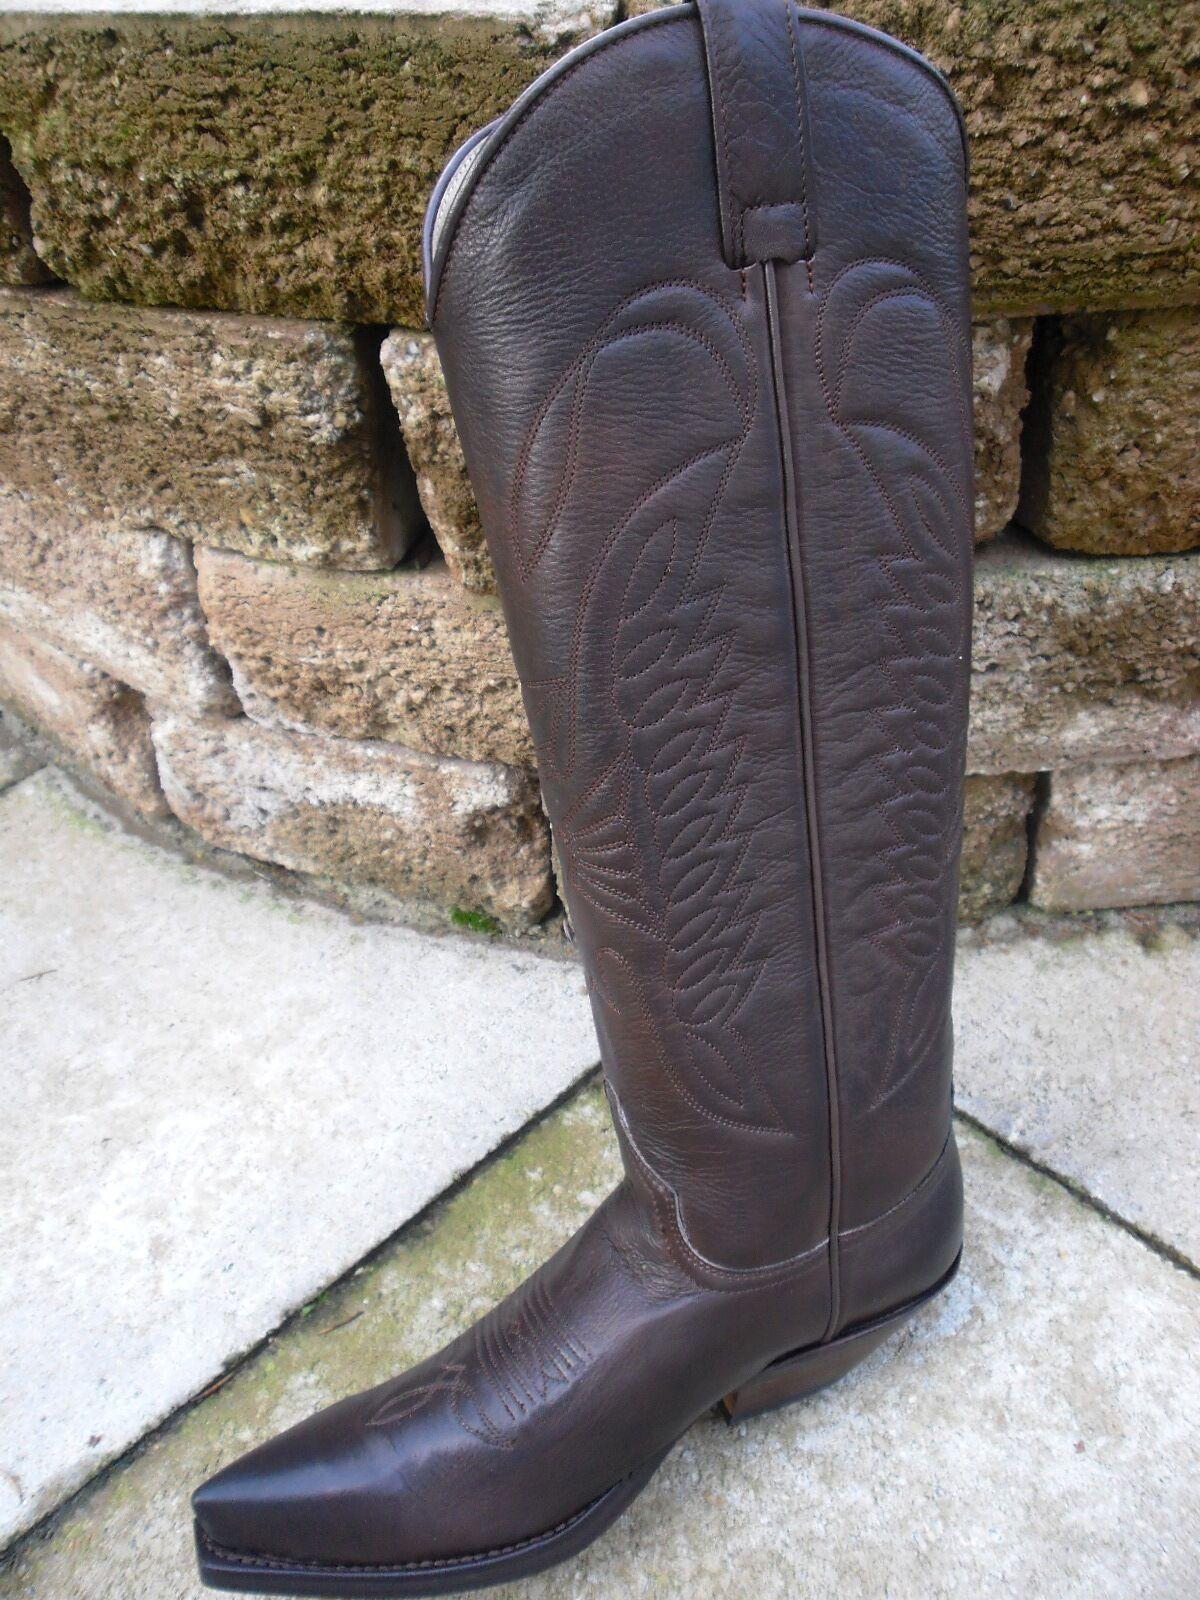 Sendra alta-Western botas 7167 marrón (amaral 222 usado estrella negra) talla 6 = 39